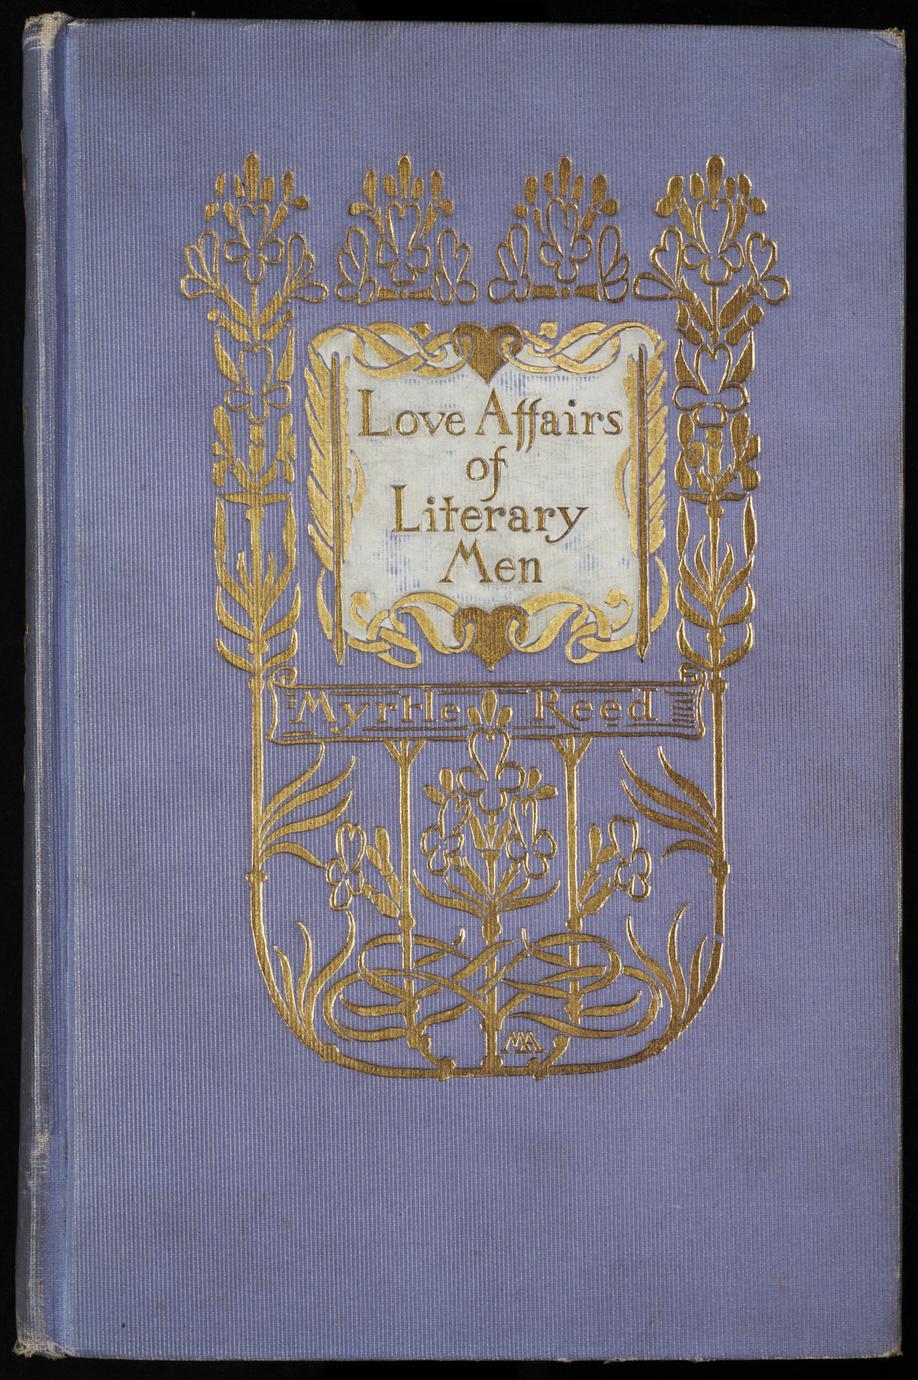 Love affairs of literary men (1 of 3)